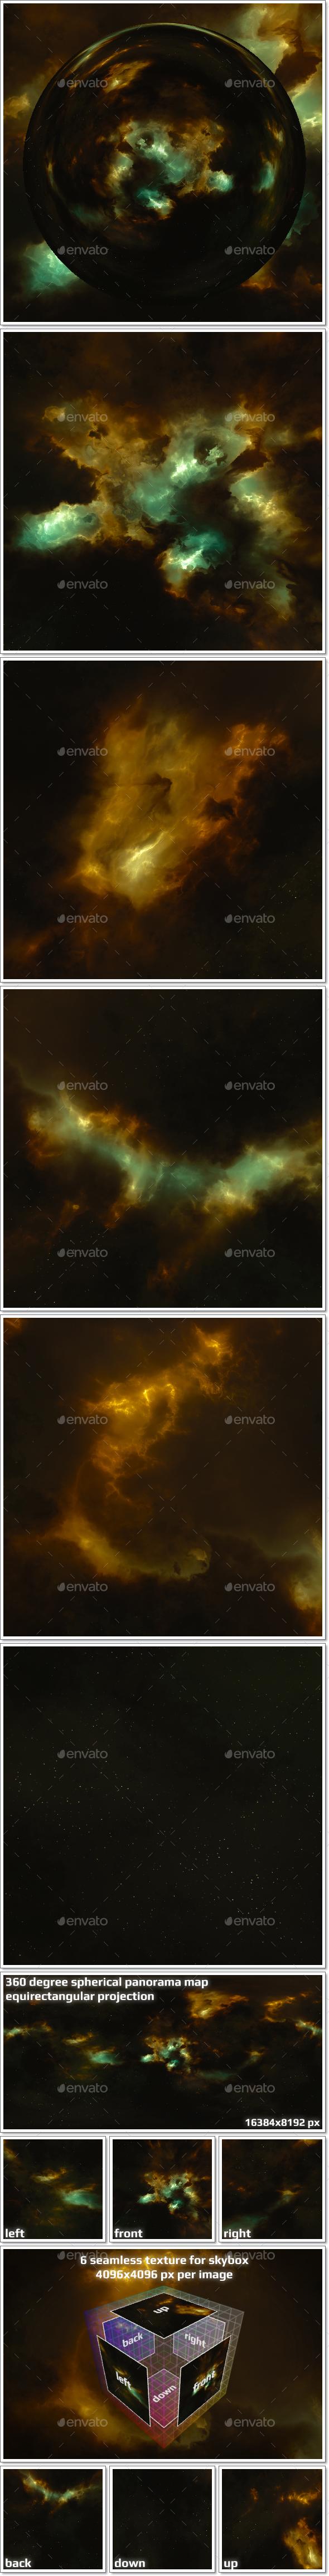 Nebula Space Environment HDRI Map 018 - 3DOcean Item for Sale